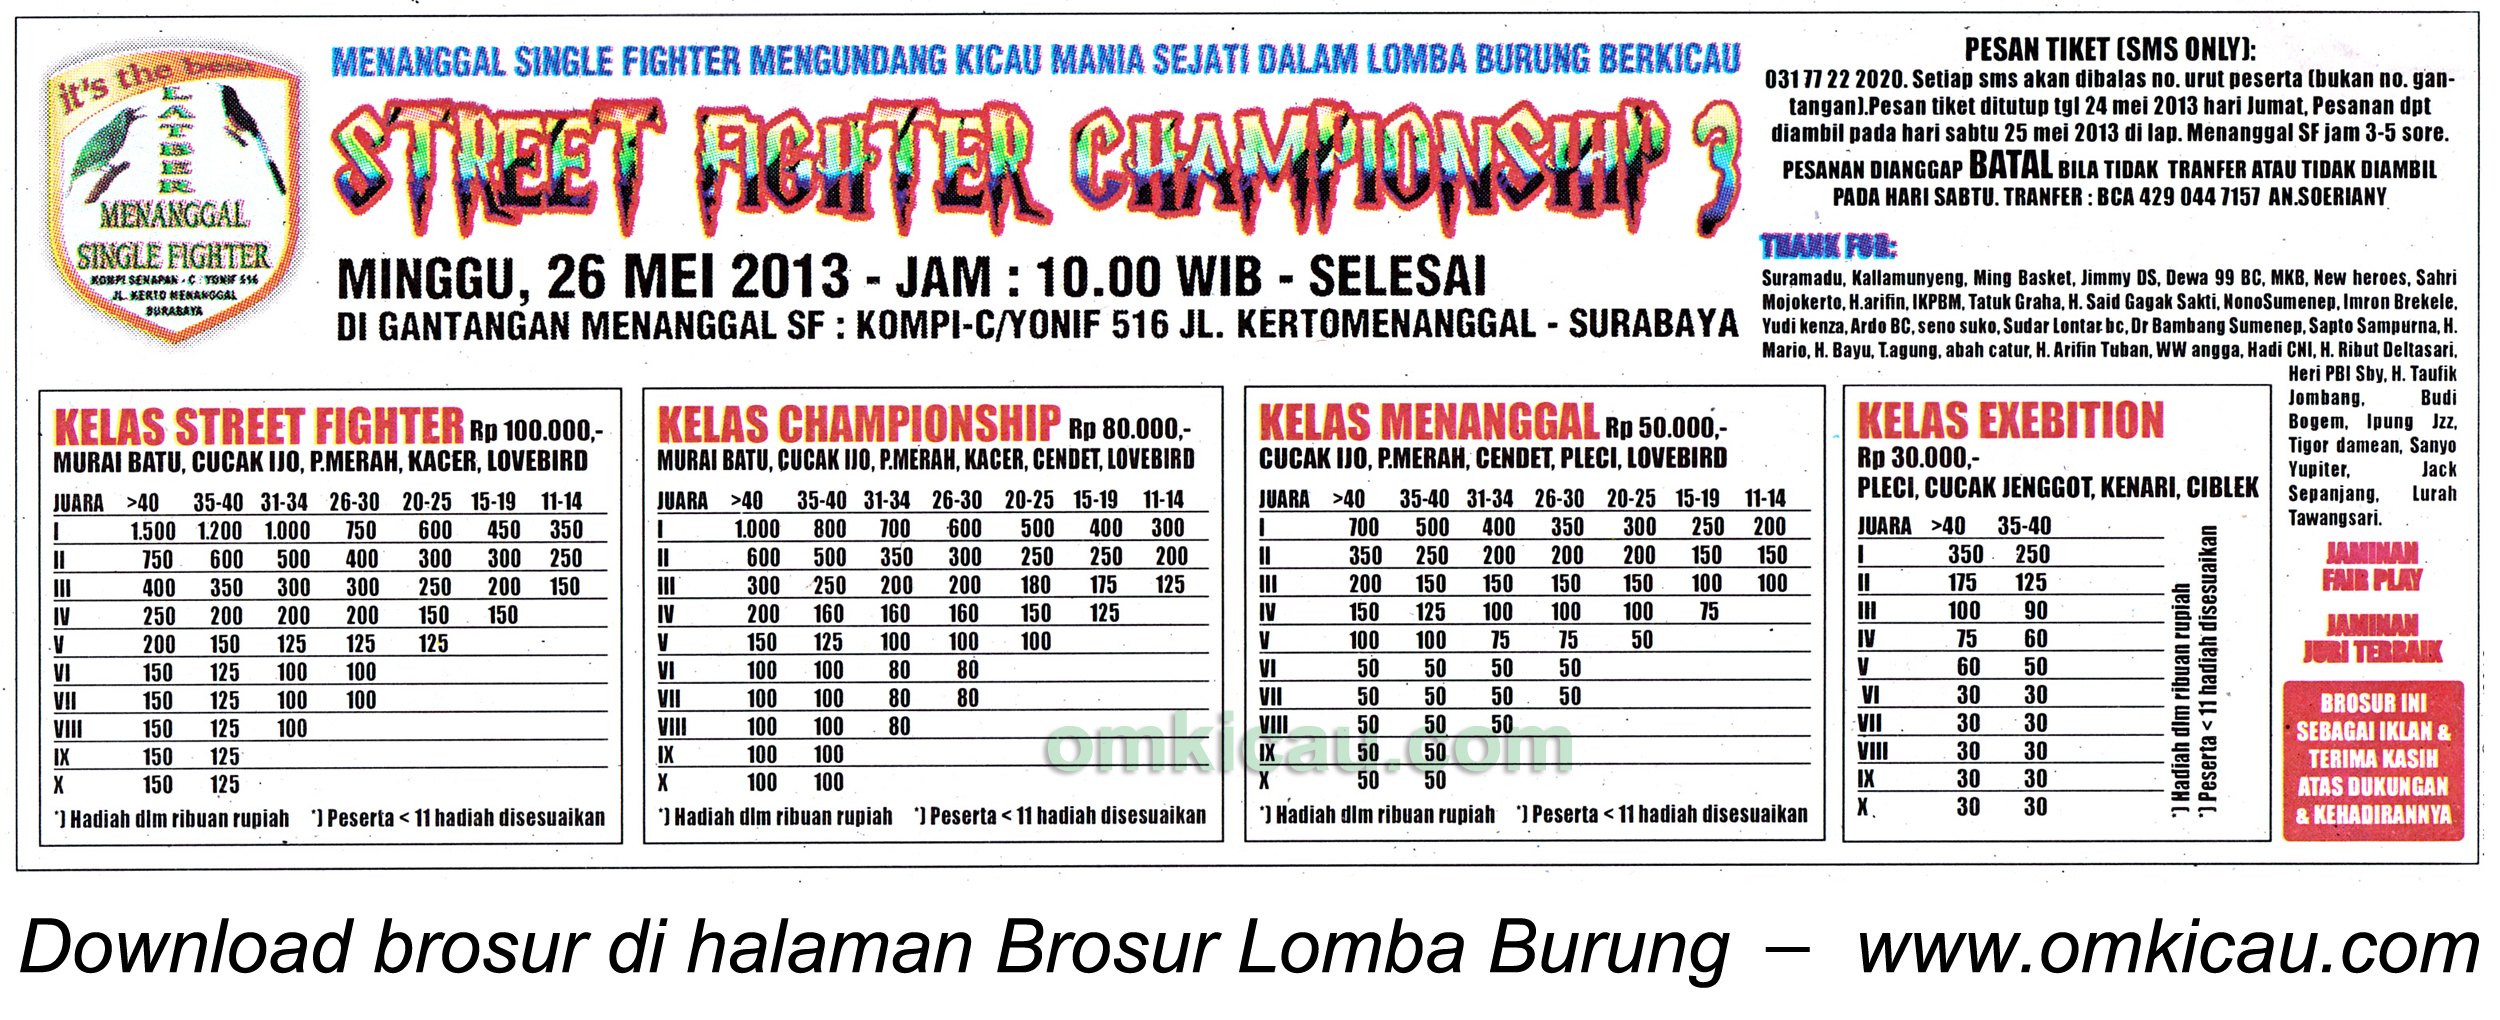 Brosur Lomba Burung Street Fighter Championship